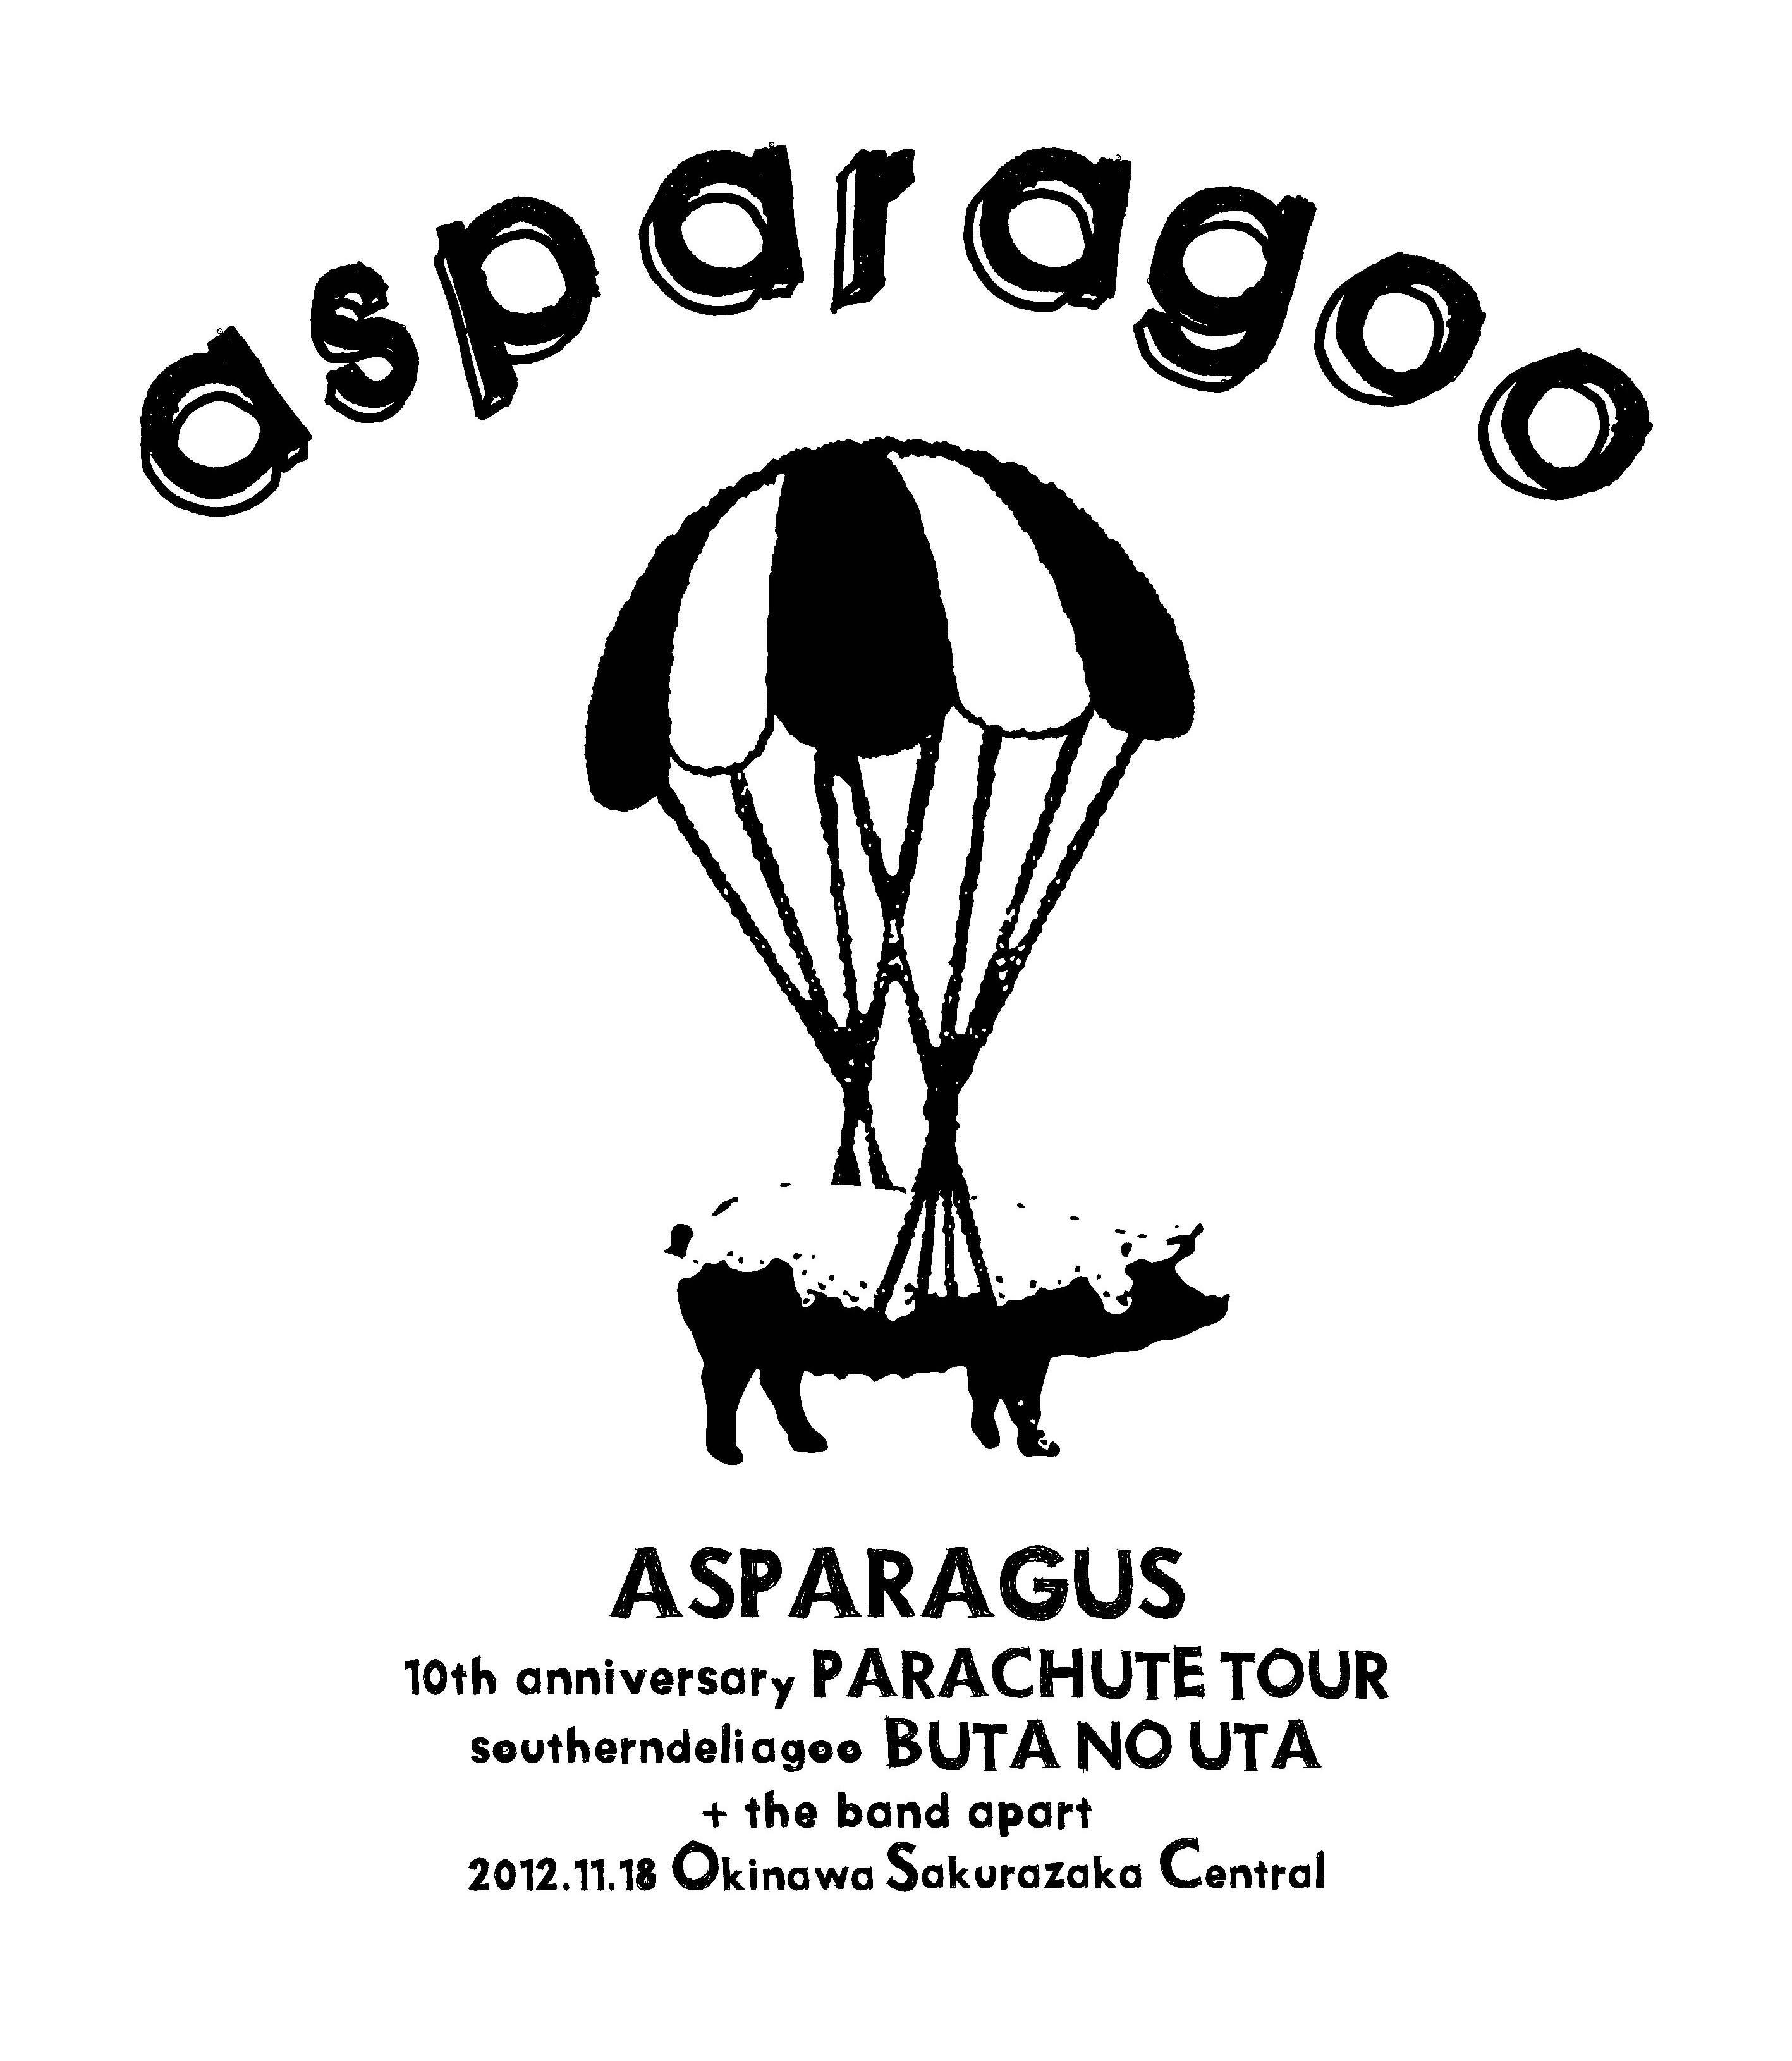 ASPARAGOO / ASPARAGUS&AGOO